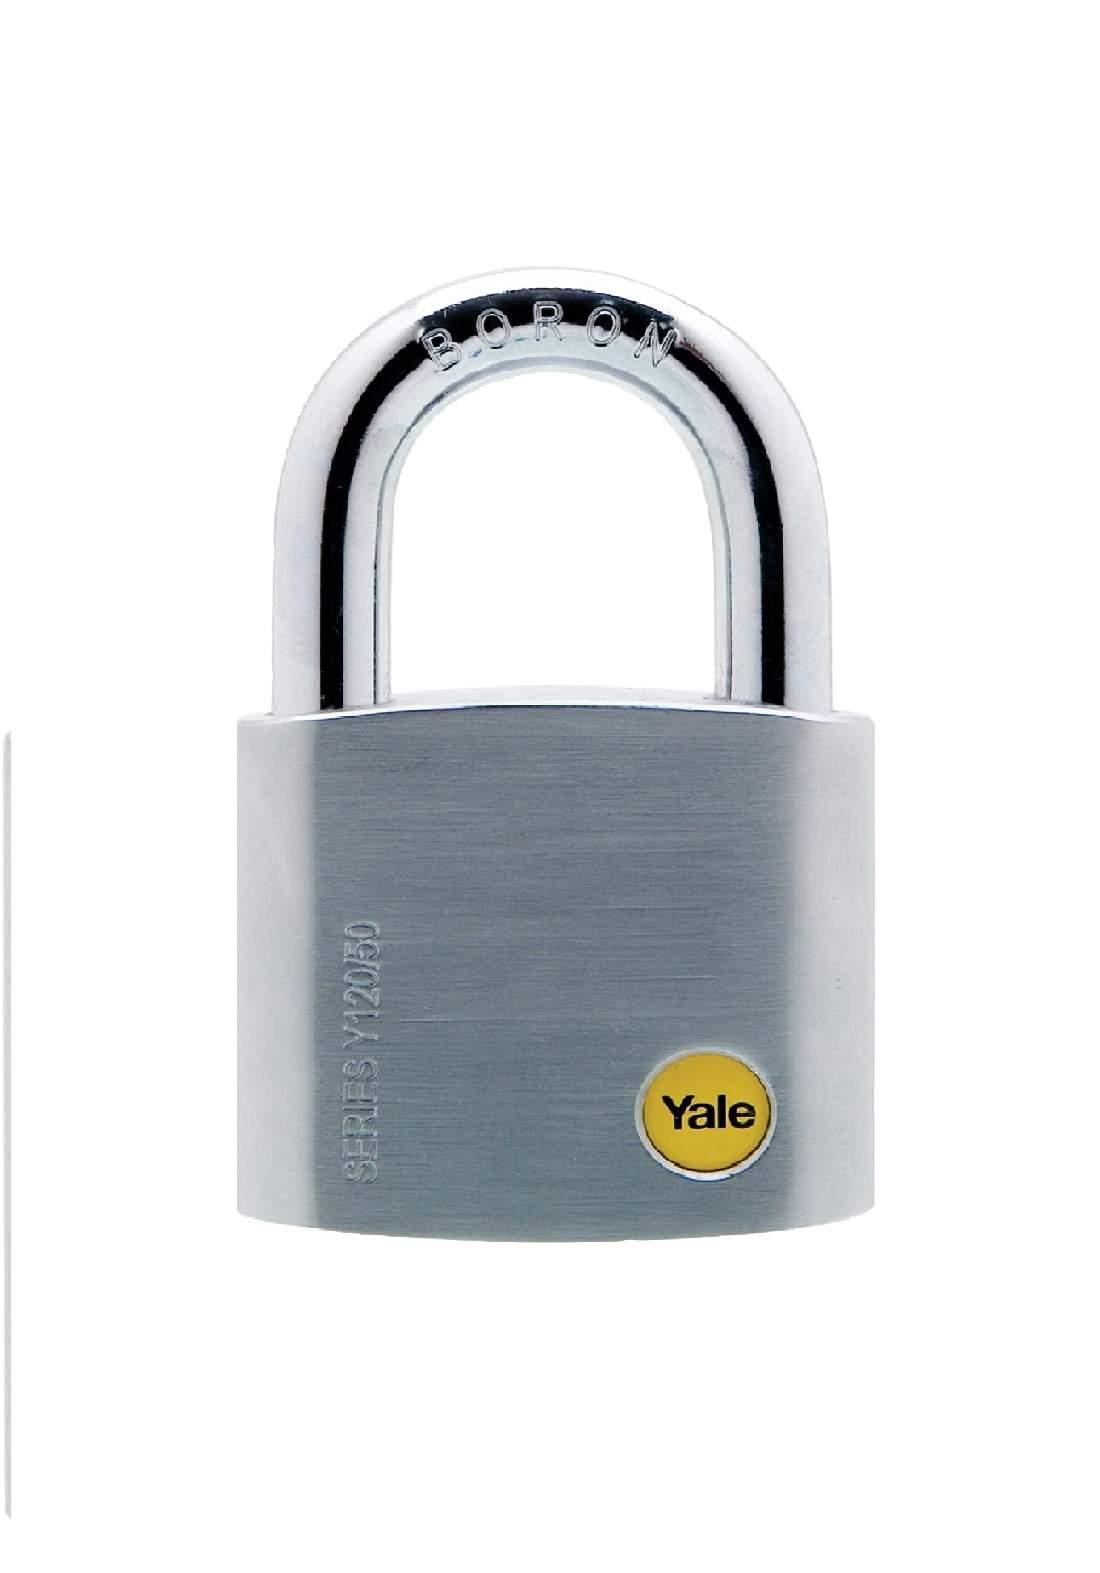 YaleY120B/50/127/1 Padlock Brass 50 mm قفل للاغراض العامة